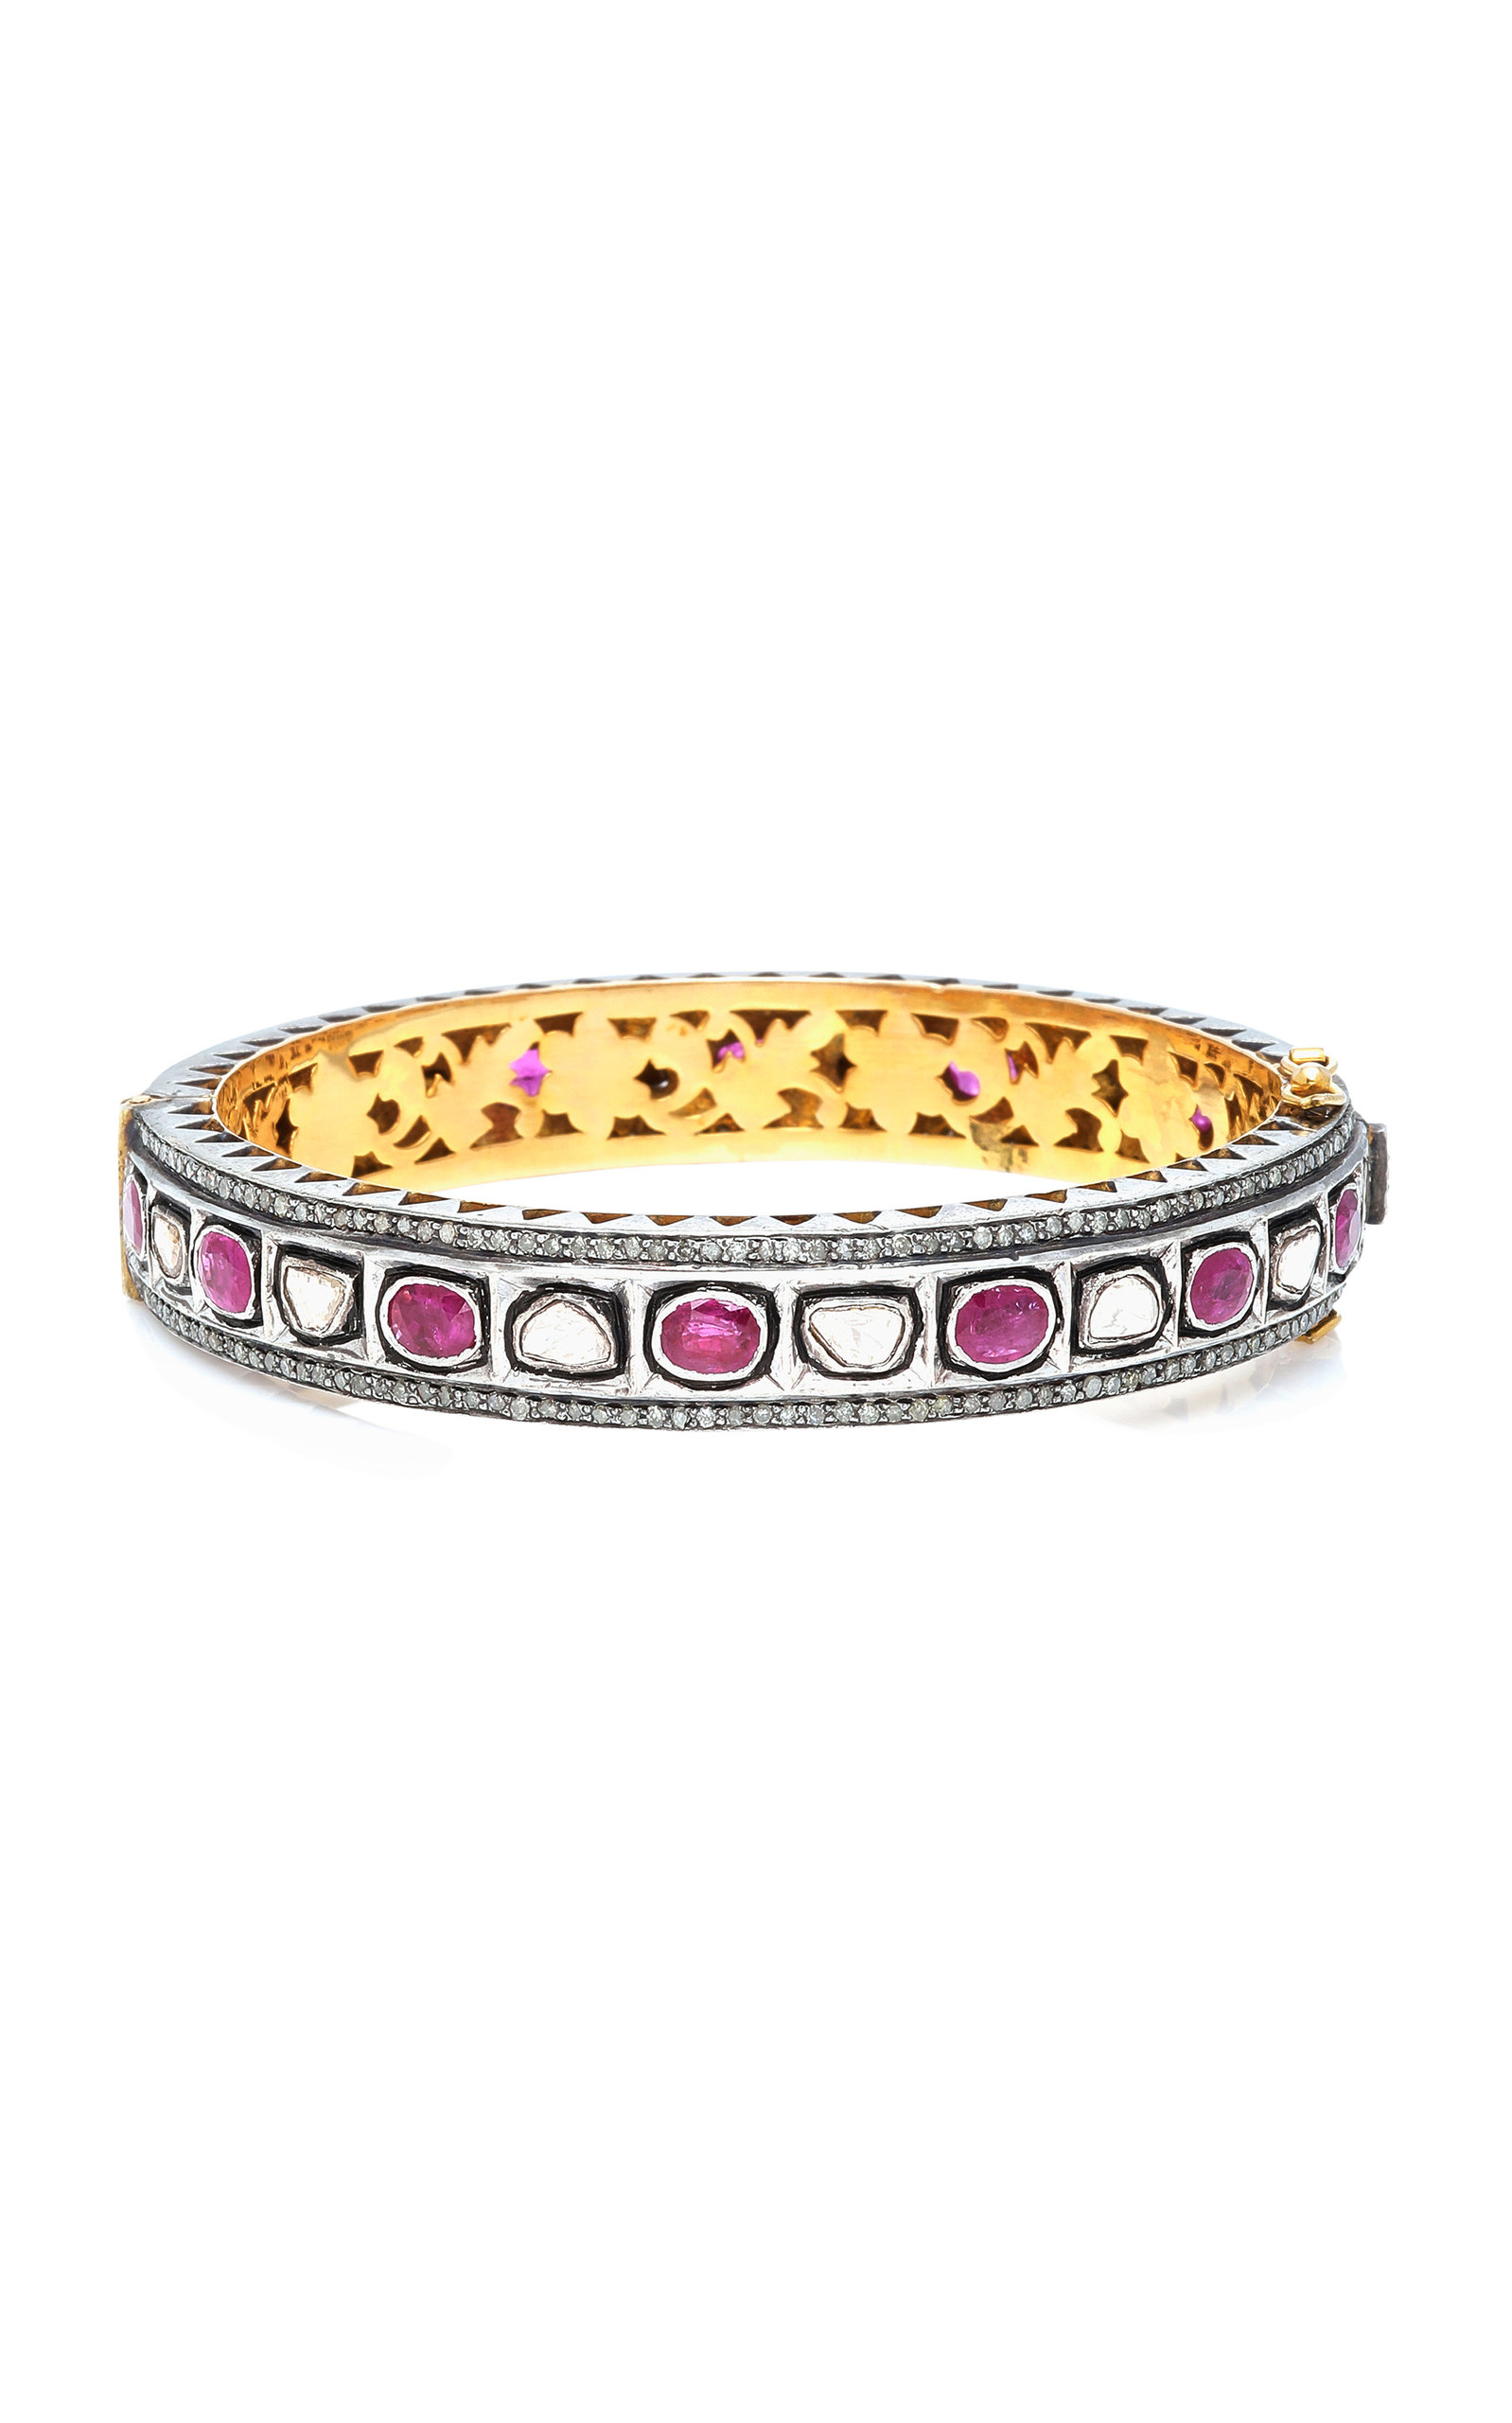 SANJAY KASLIWAL 14K Gold Silver Ruby And Diamond Bracelet in Red